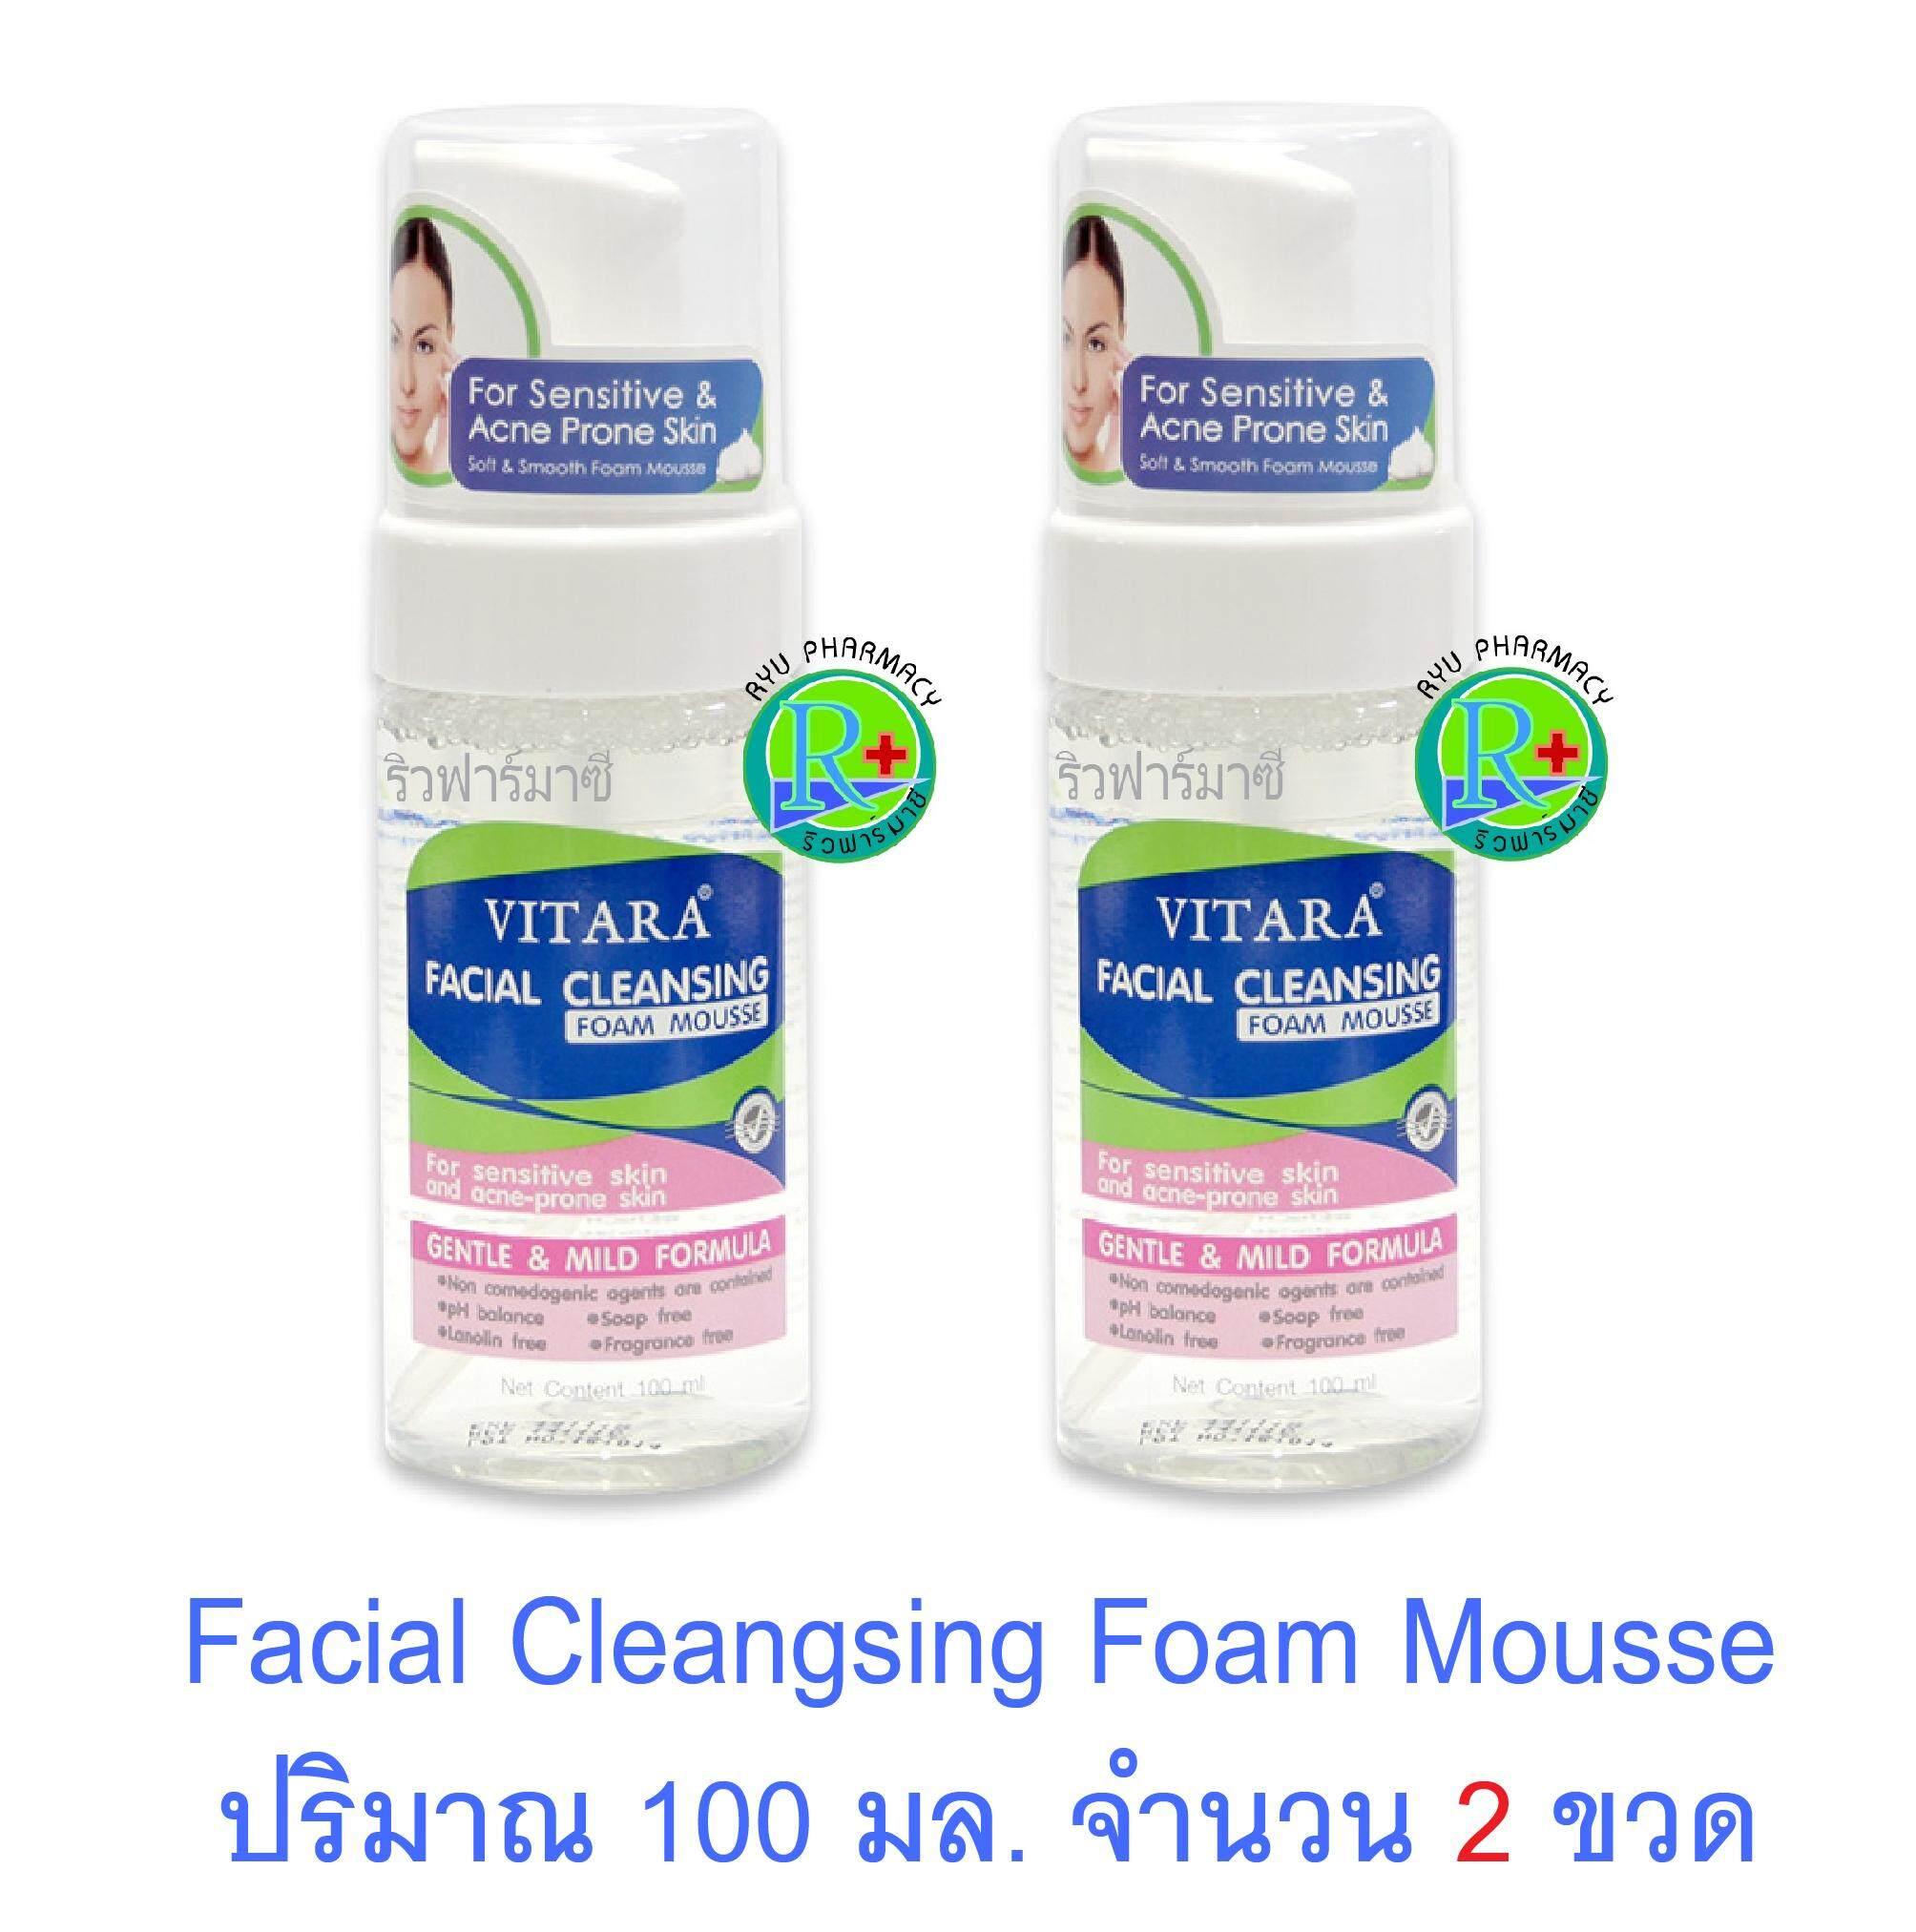 VITARA FACIAL CLEANSING FOAM MOUSSE ไวทาร่า คลีนซิ่ง โฟมมูส โฟมล้างหน้า สูตรอ่อนโยน 100 มล. 2 ขวด